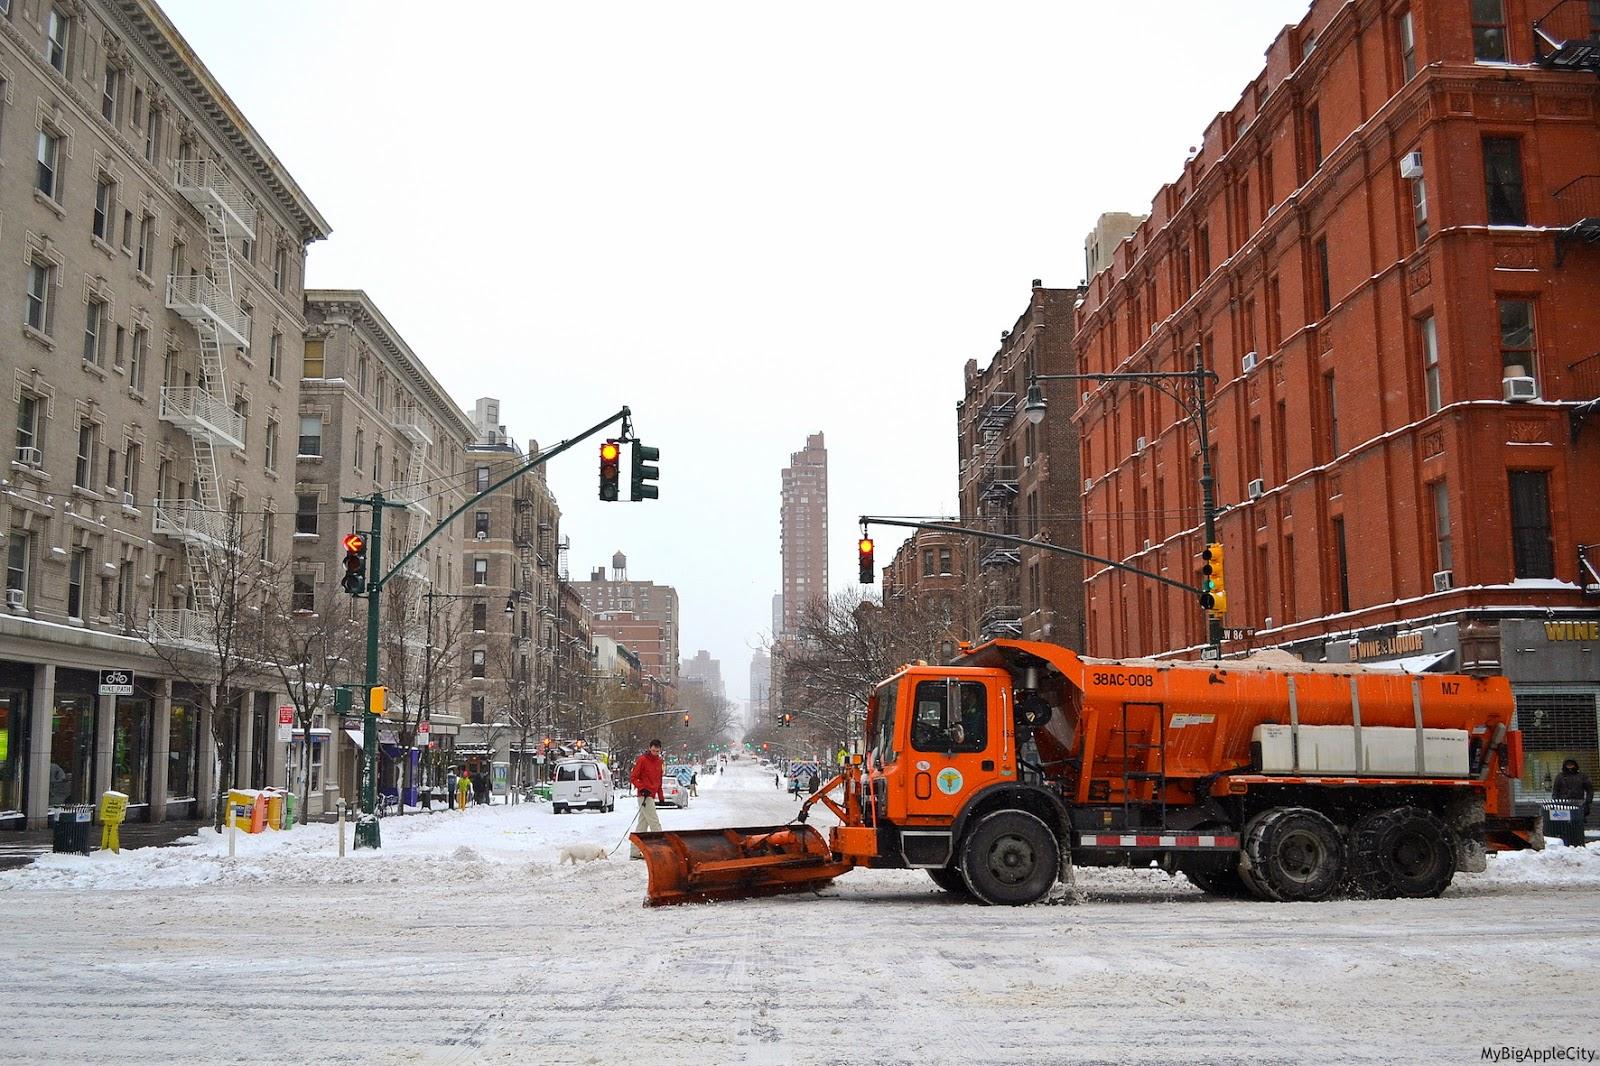 juno-2015-NYC-Blizzard-best-photo